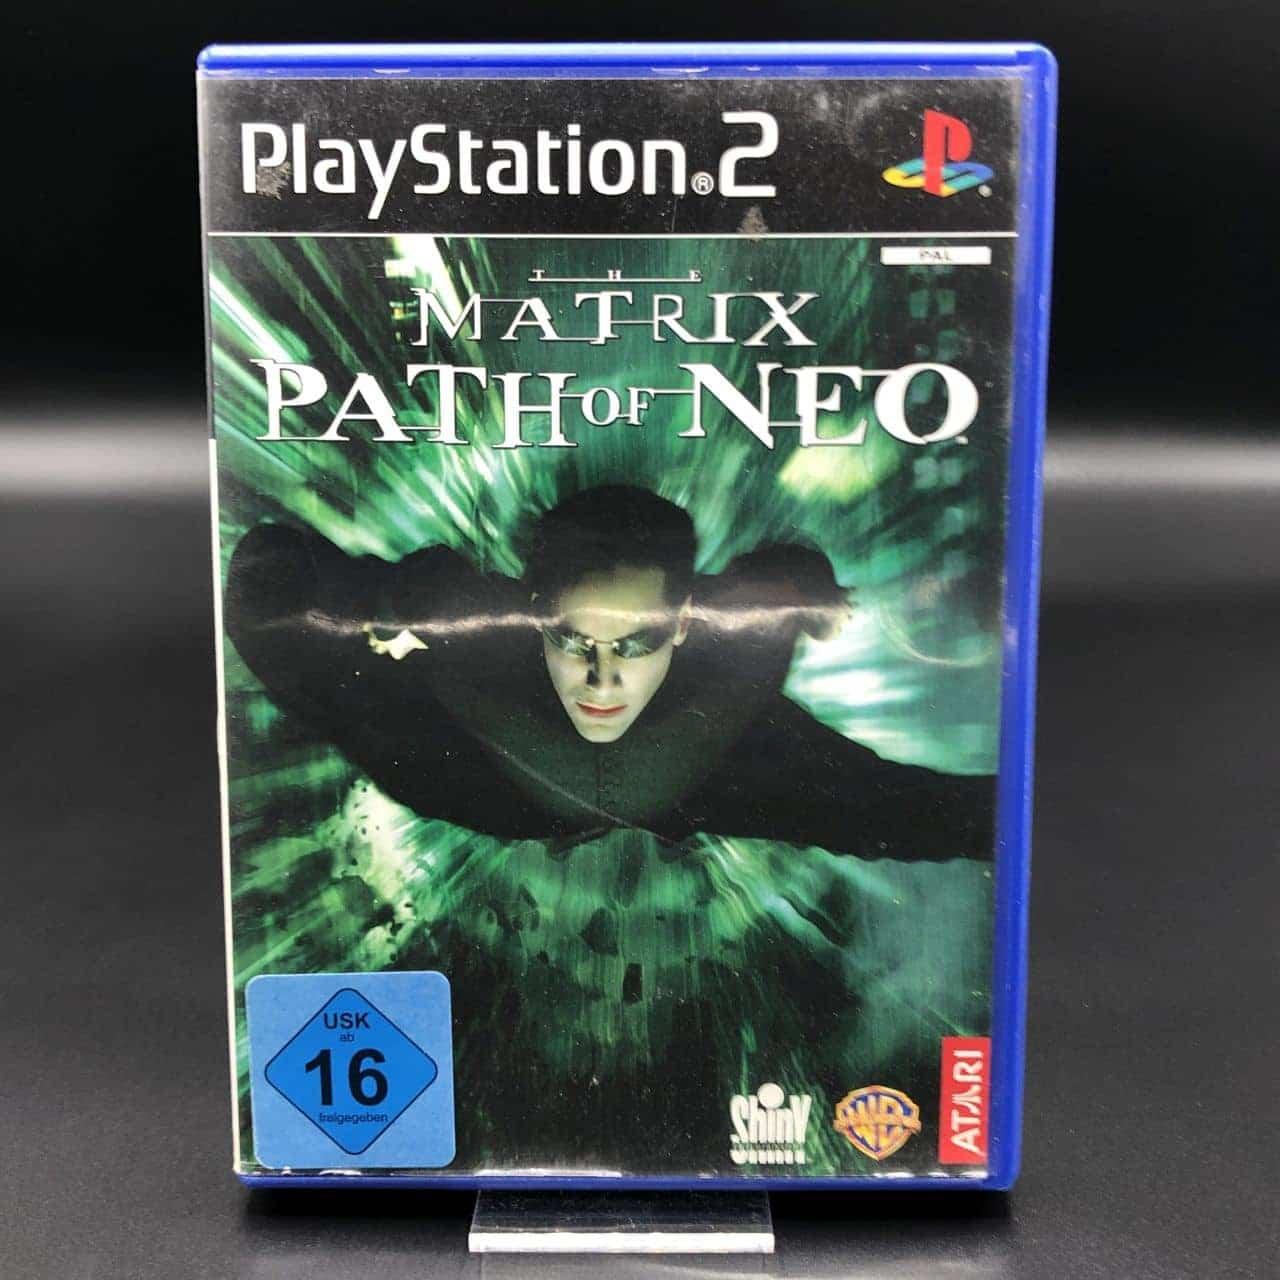 PS2 The Matrix: Path of Neo (Komplett) (Gut) Sony PlayStation 2